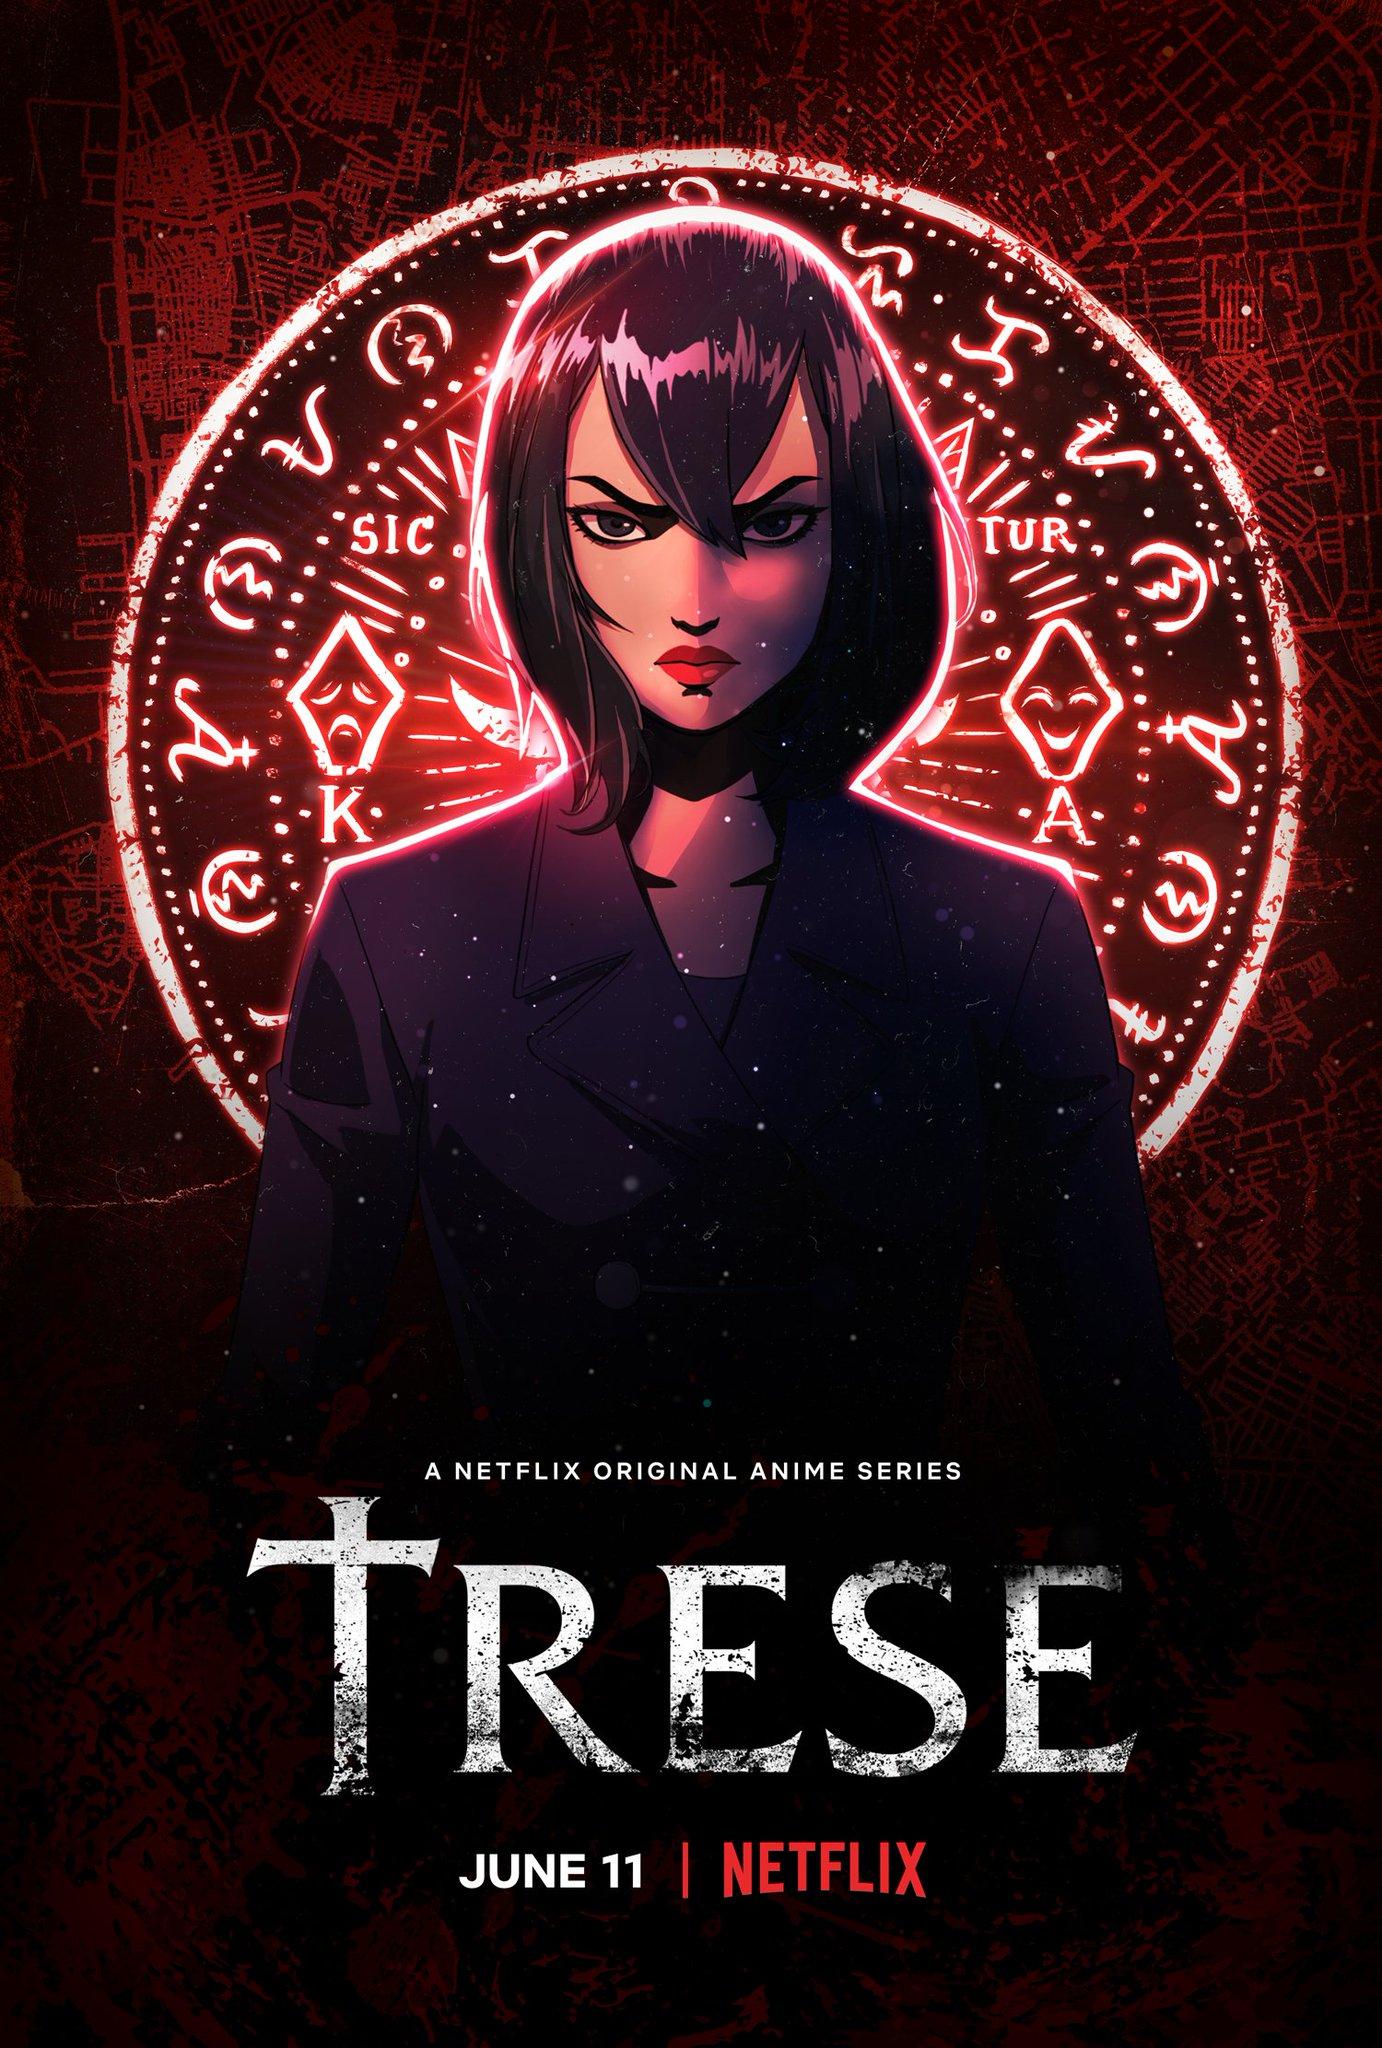 Trese (2021) English S01 Complete Netflix Original TV Series 500MB HDRip 480p